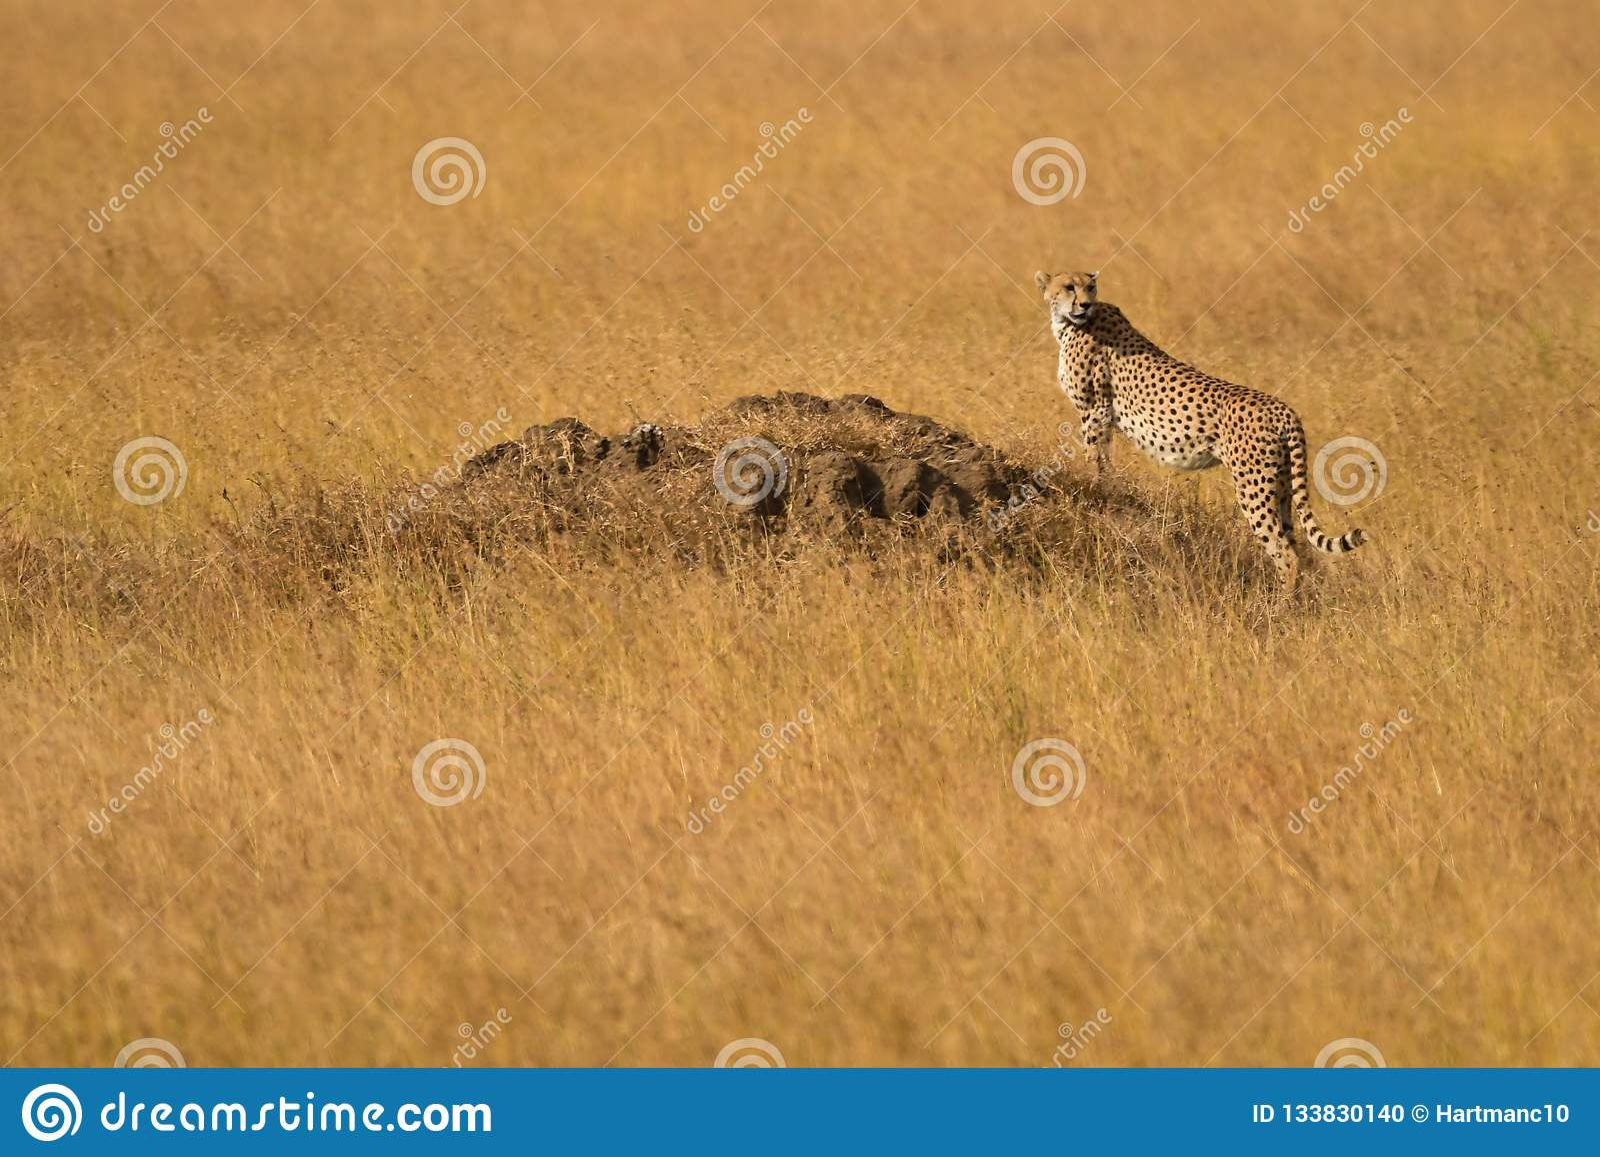 Cheetah in the Serengeti Plains